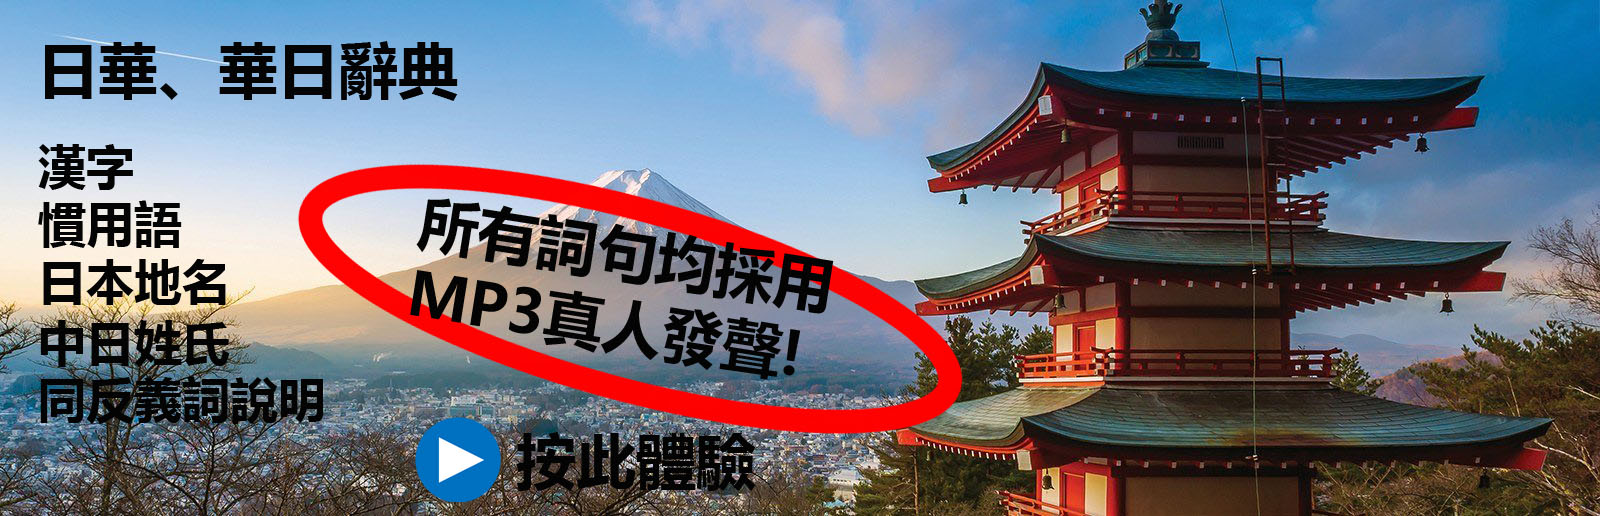 japan dict banner